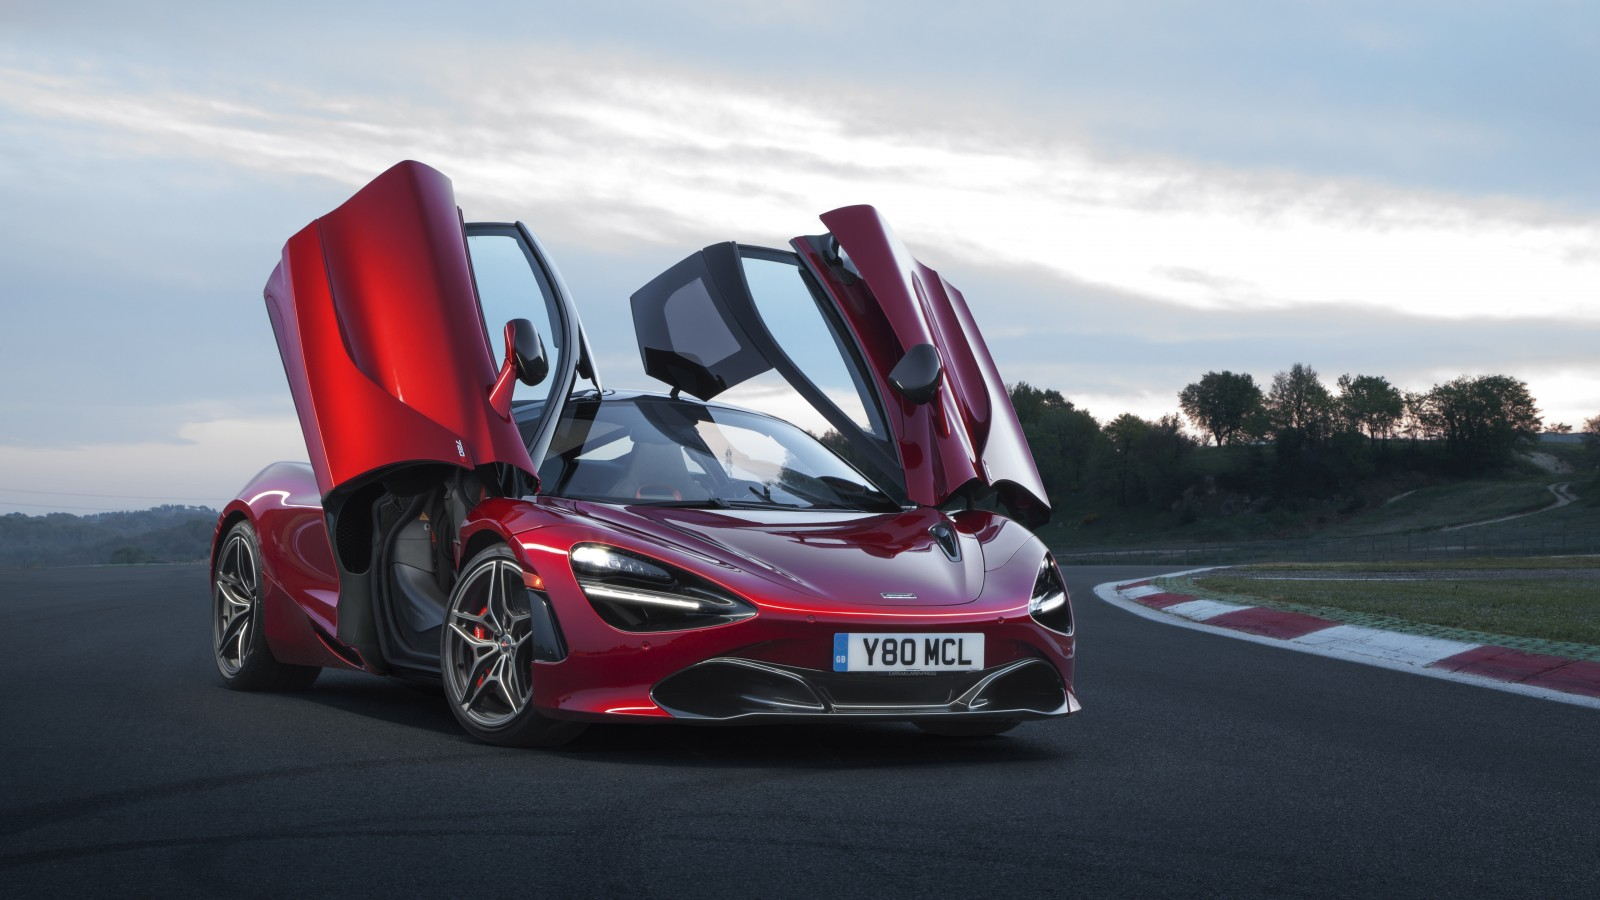 2018 McLaren 720S Memphis Red Wallpaper | HD Car ...